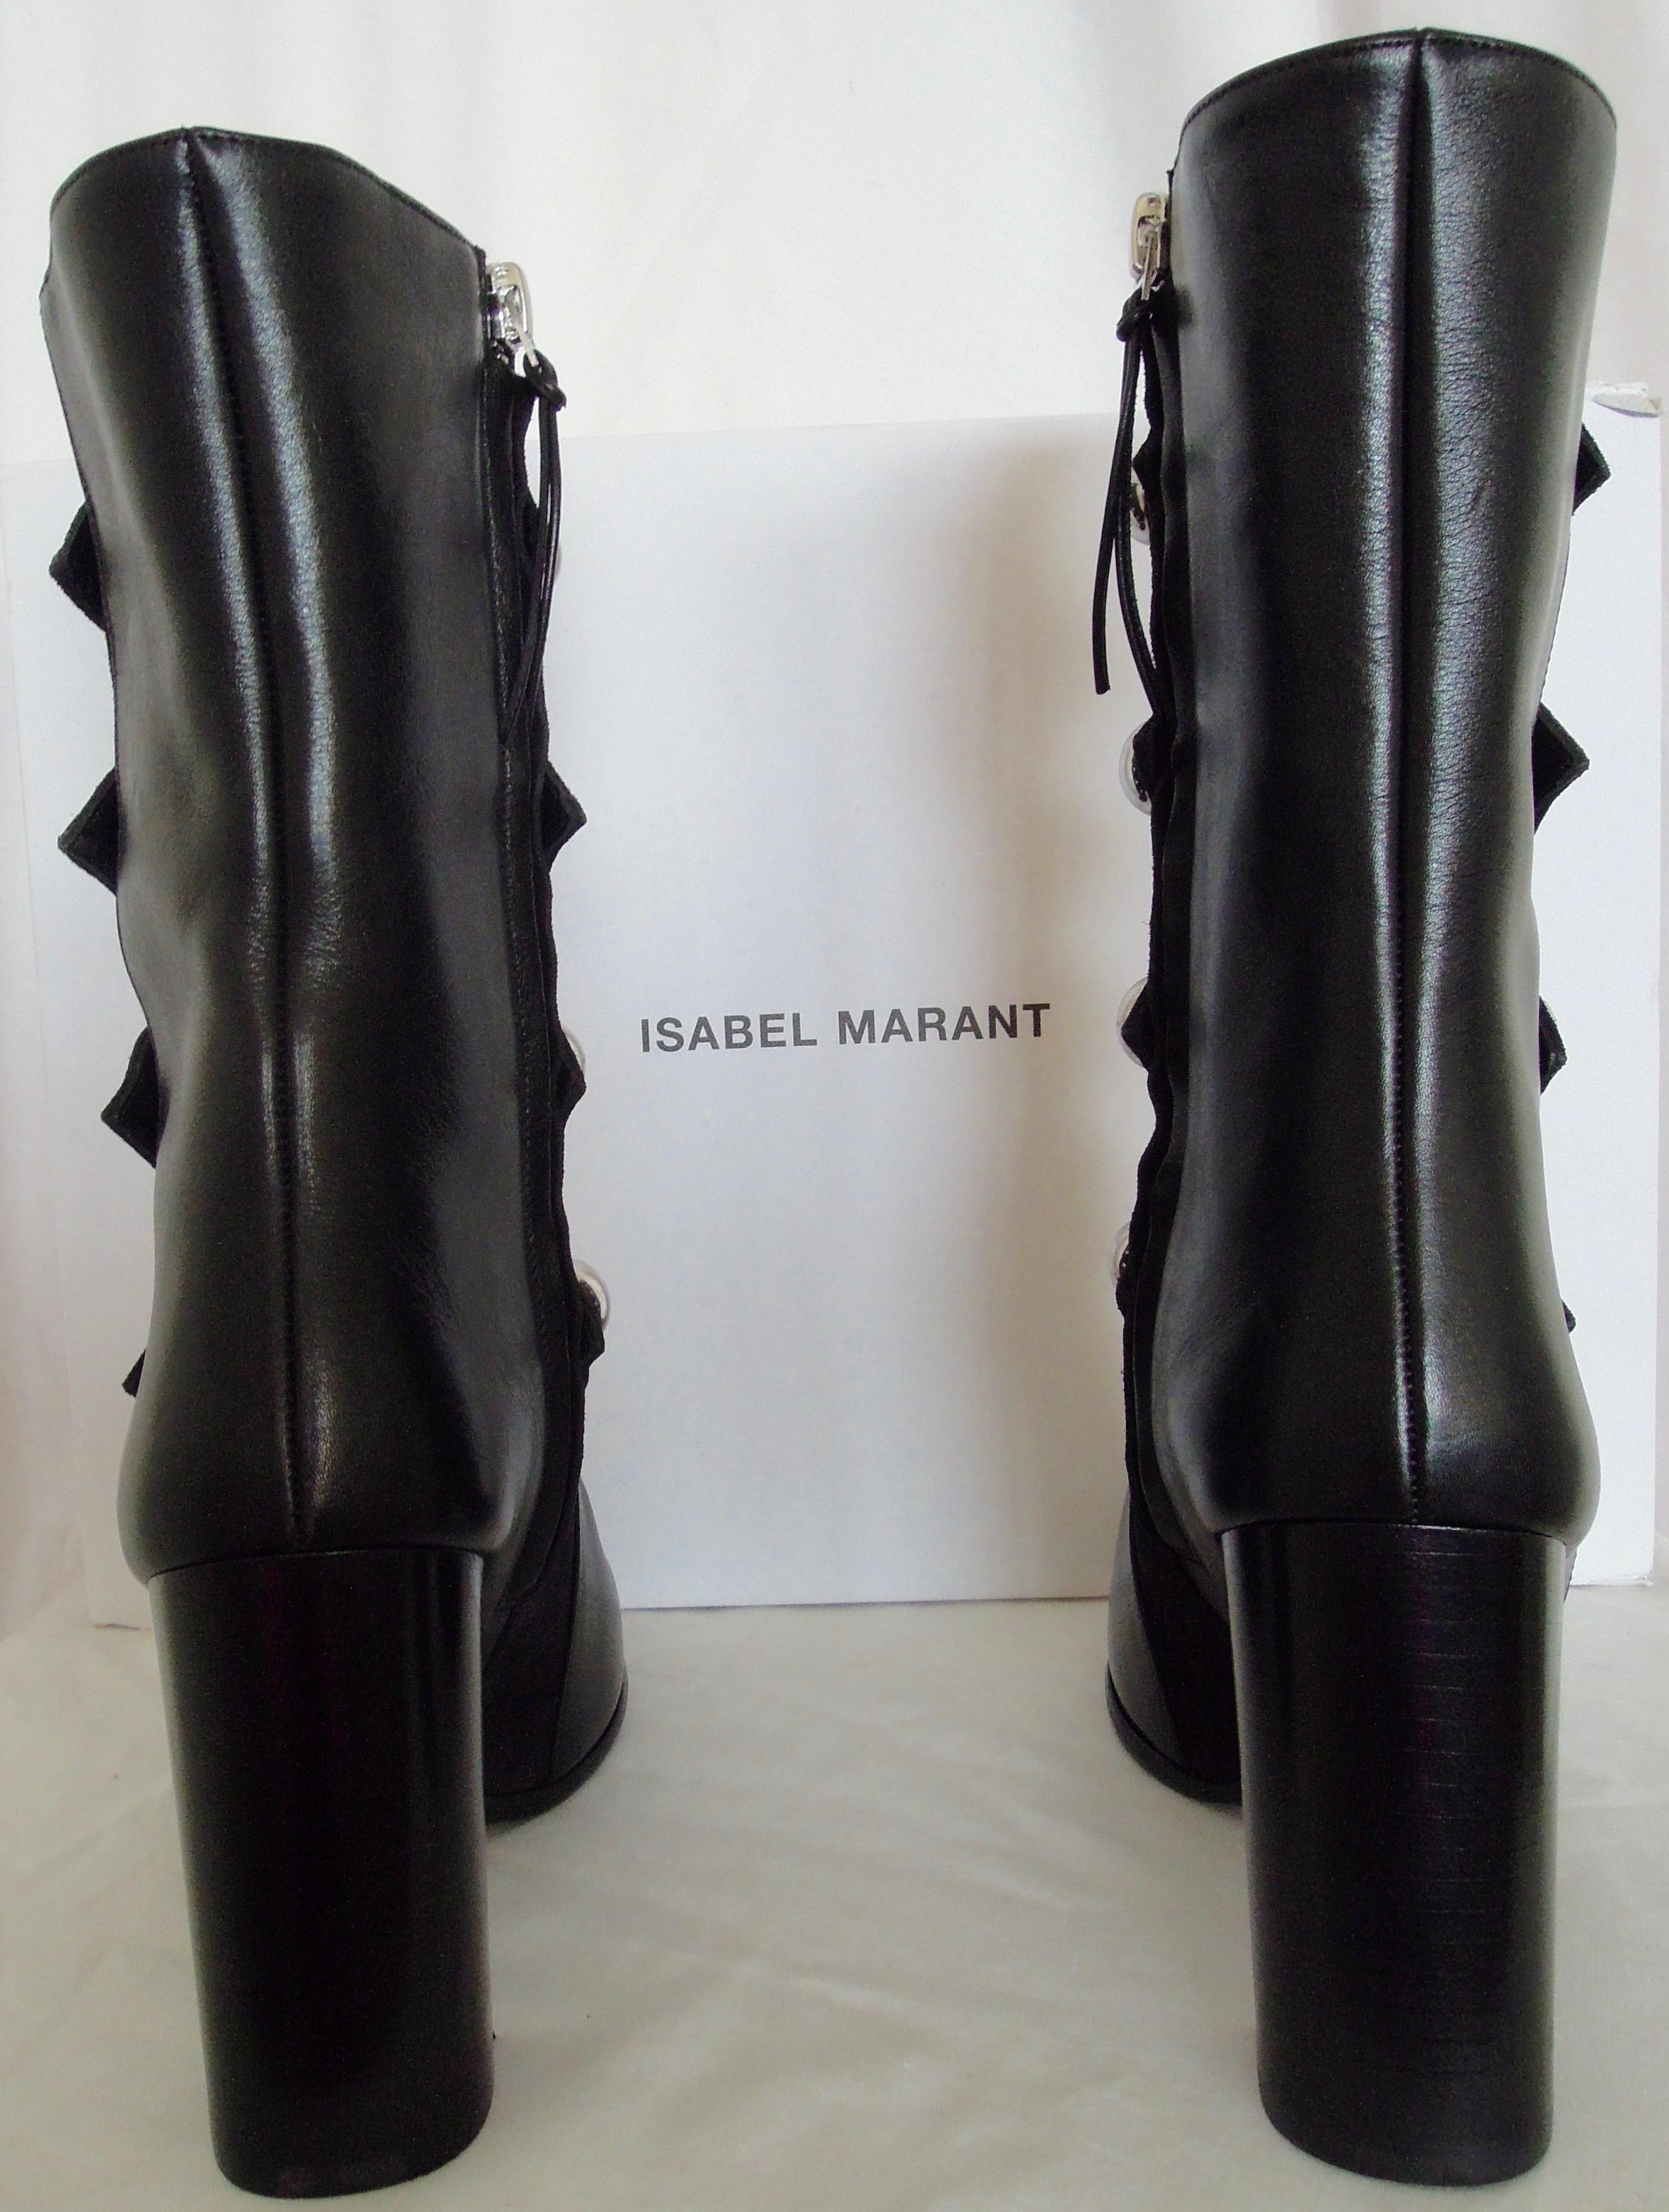 1763b1eff90f01 Isabel Marant Arnie Boots